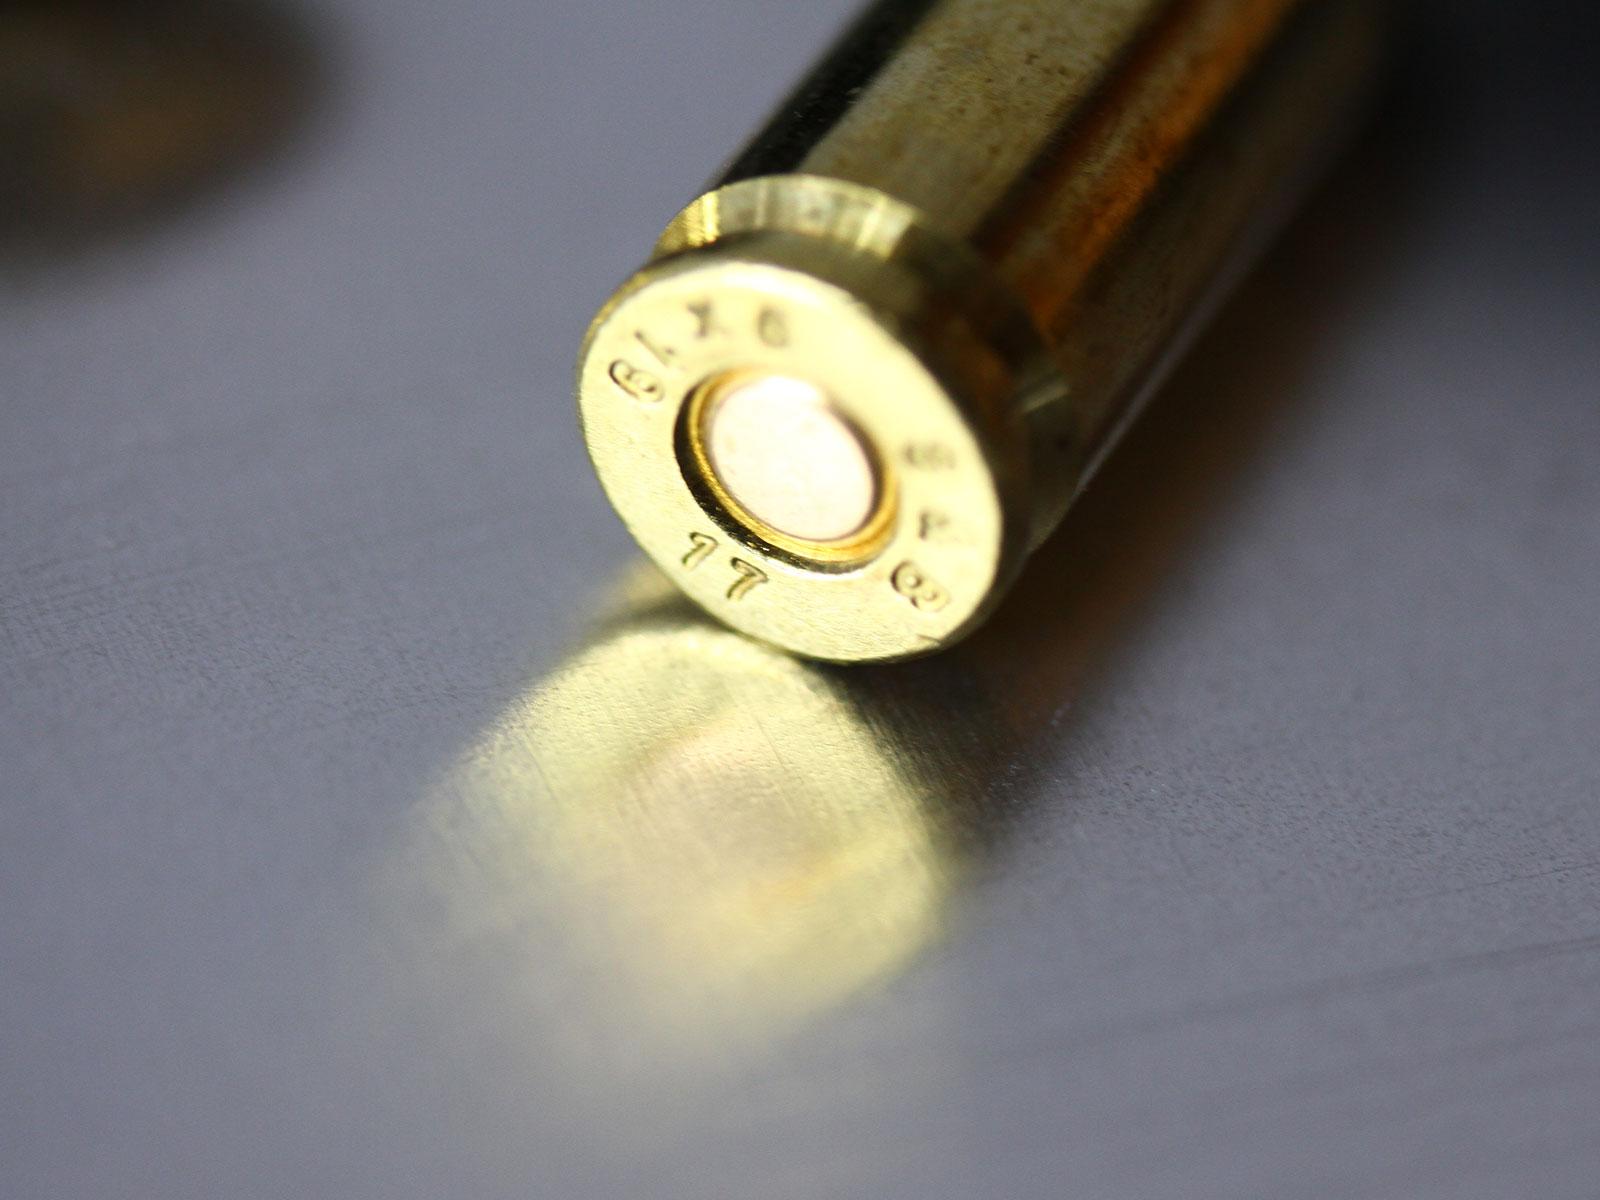 SH_Web_Wir_Waffen_Glock17-4_1800x1200